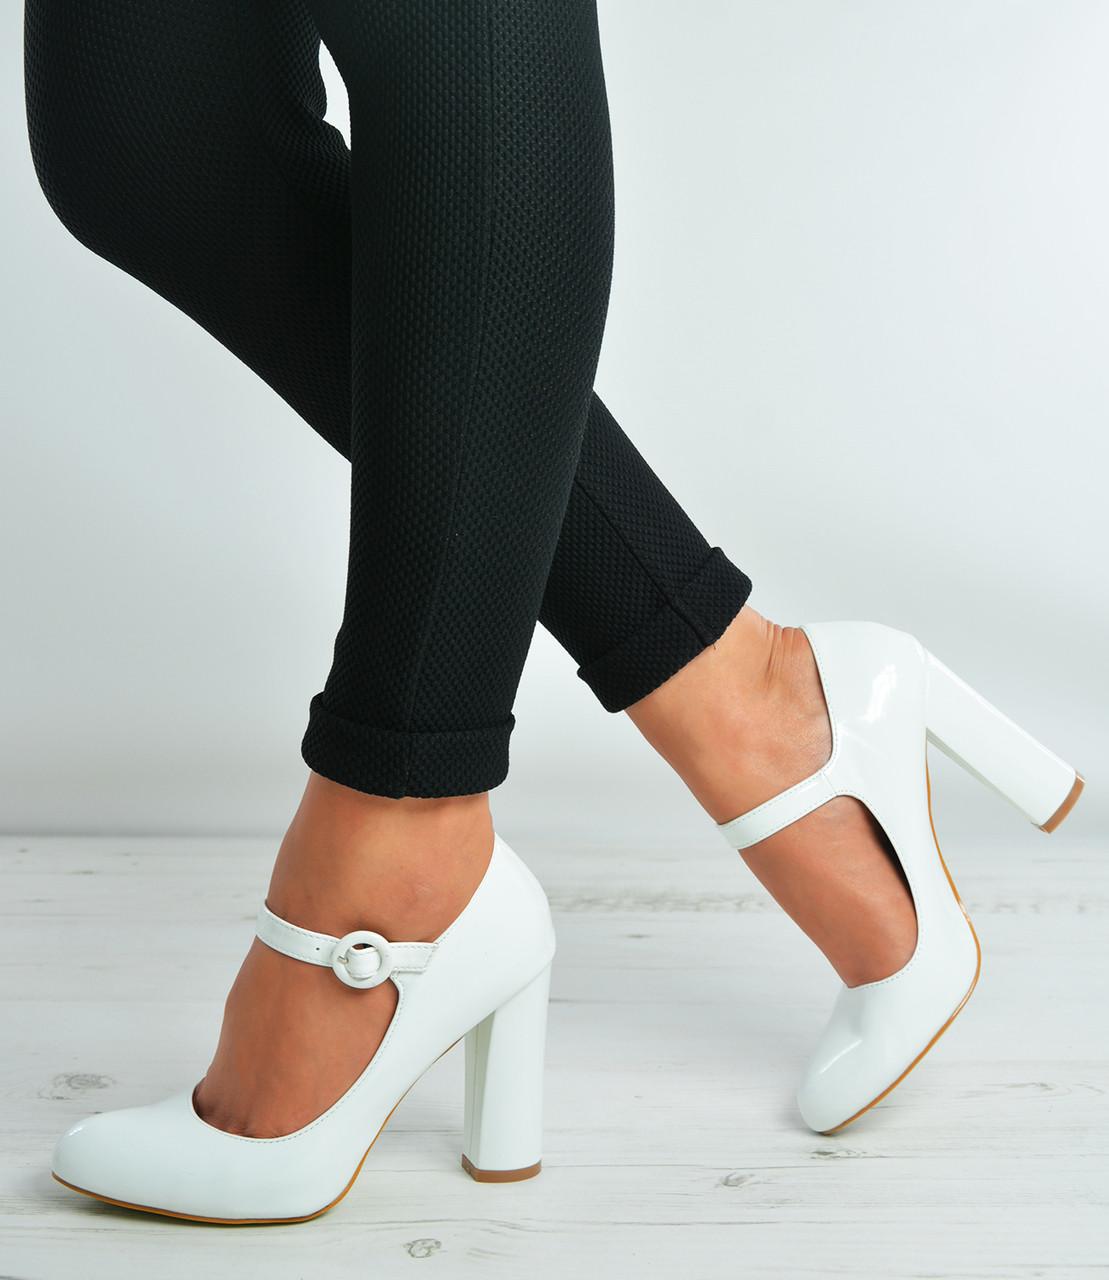 White Patent Ankle Strap Block Heel Court Pumps Shoes Size Uk 3-8